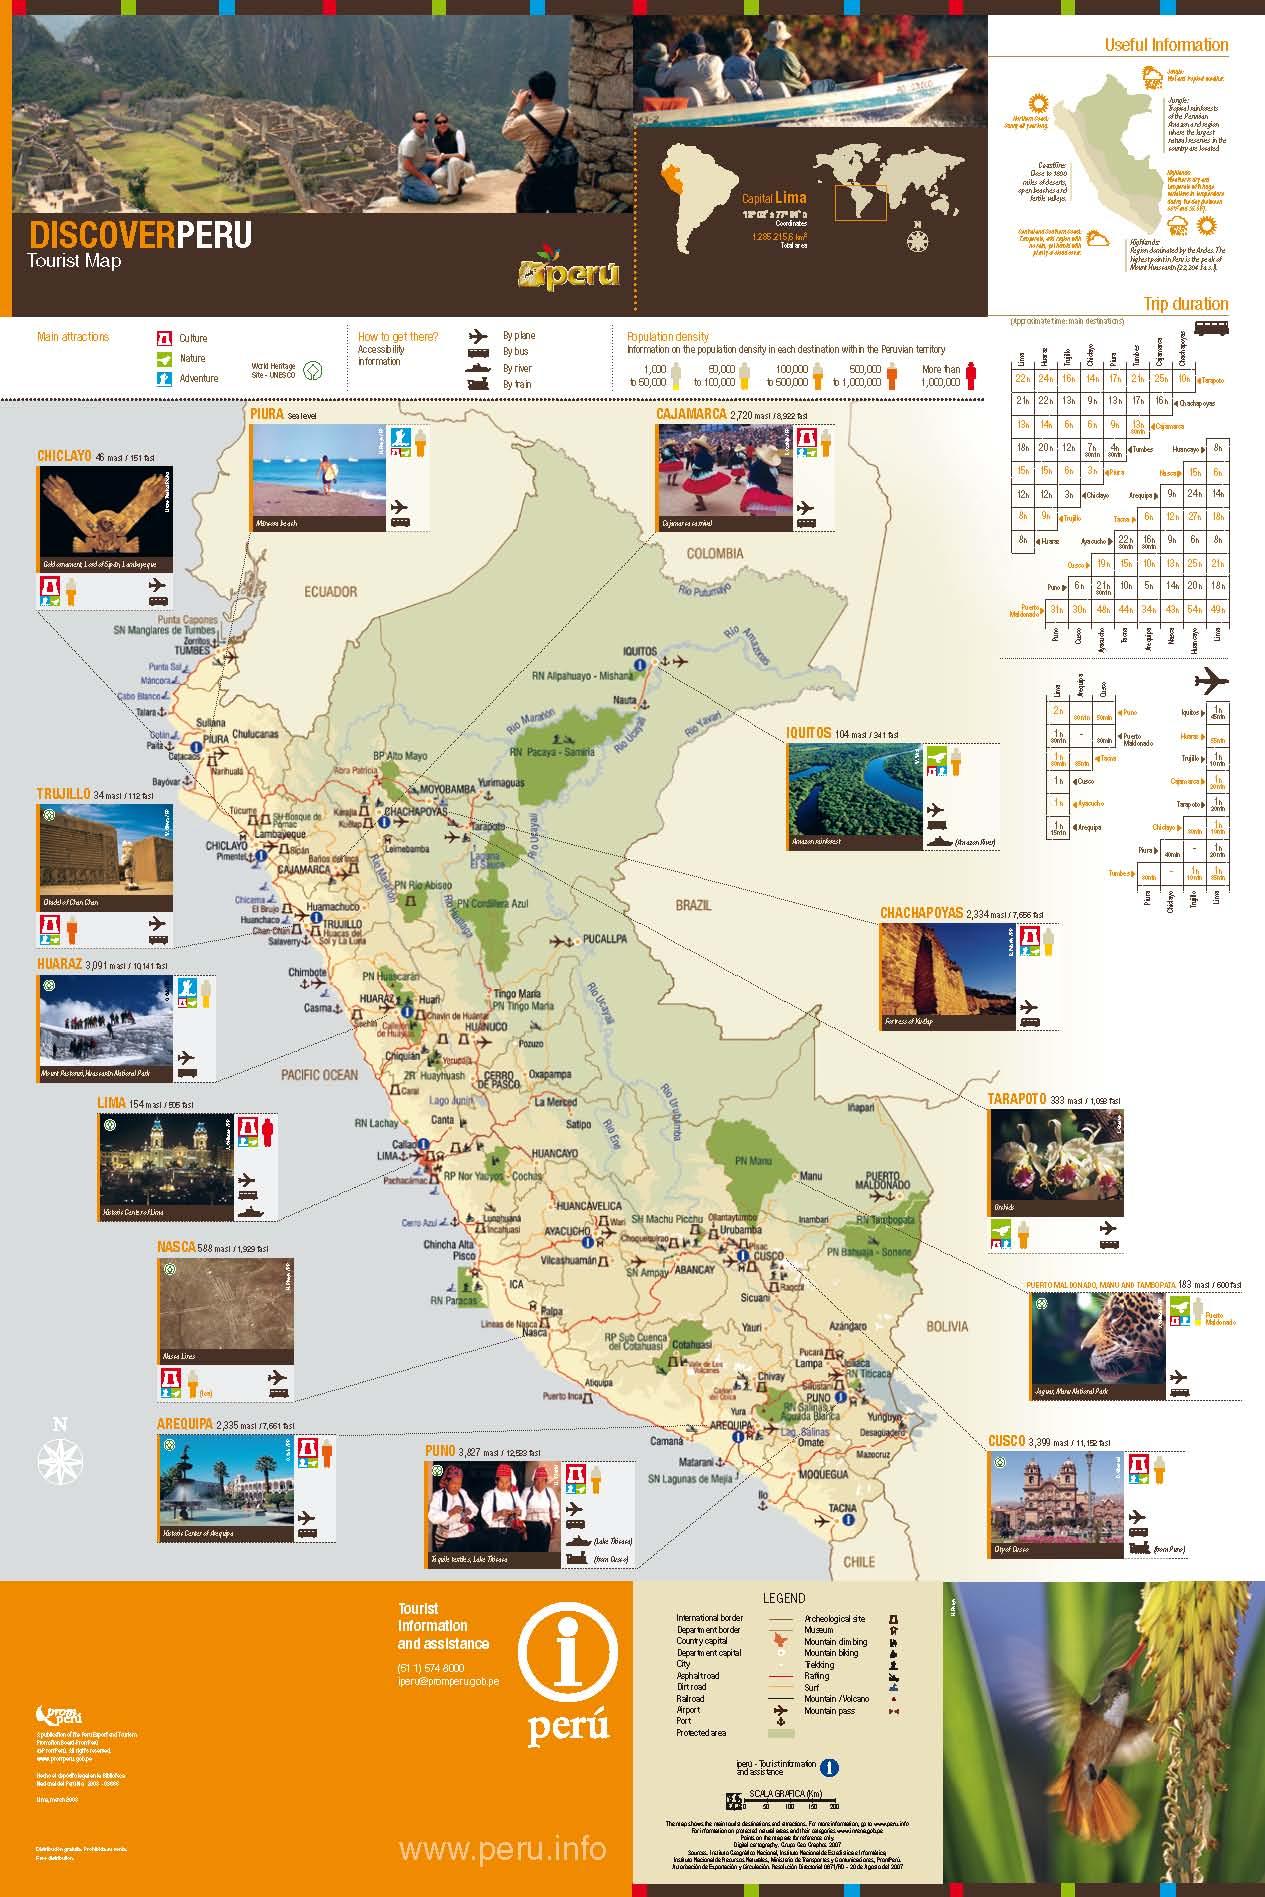 Peru tourism map images peru tourism map peru tourist map peru tourist map source abuse report sciox Gallery